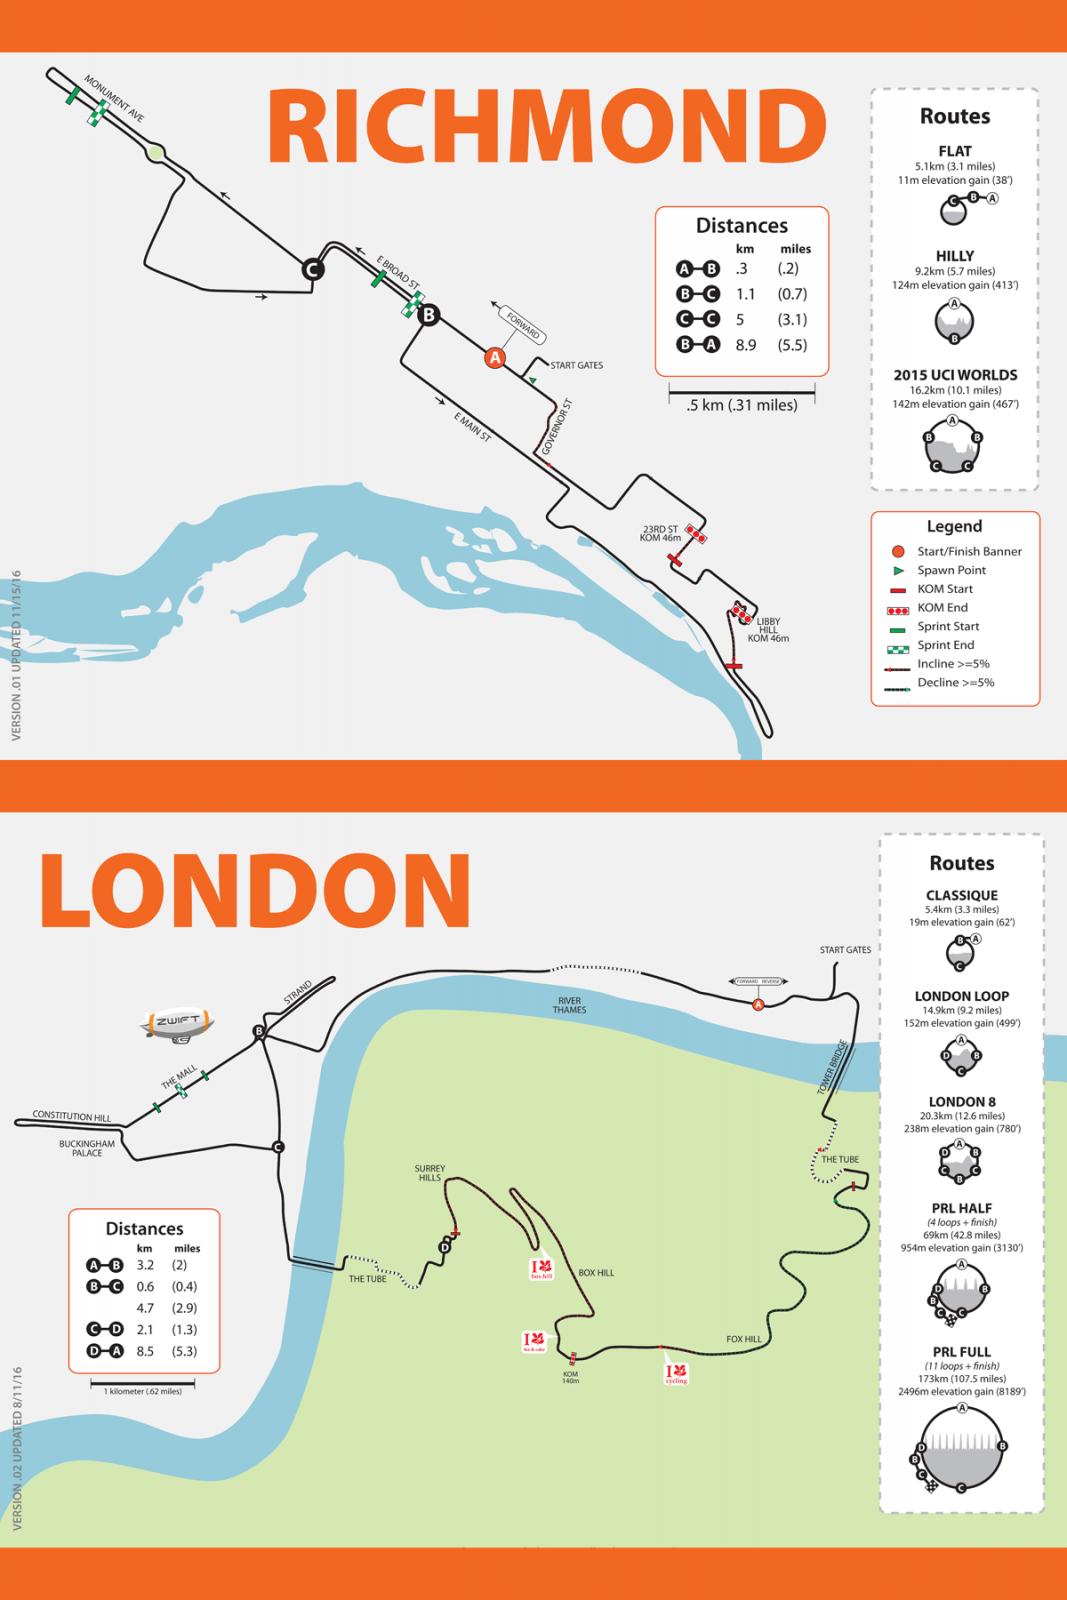 Richmond London Map.Watopia Richmond And London Map Posters In Stock Zwift Insider